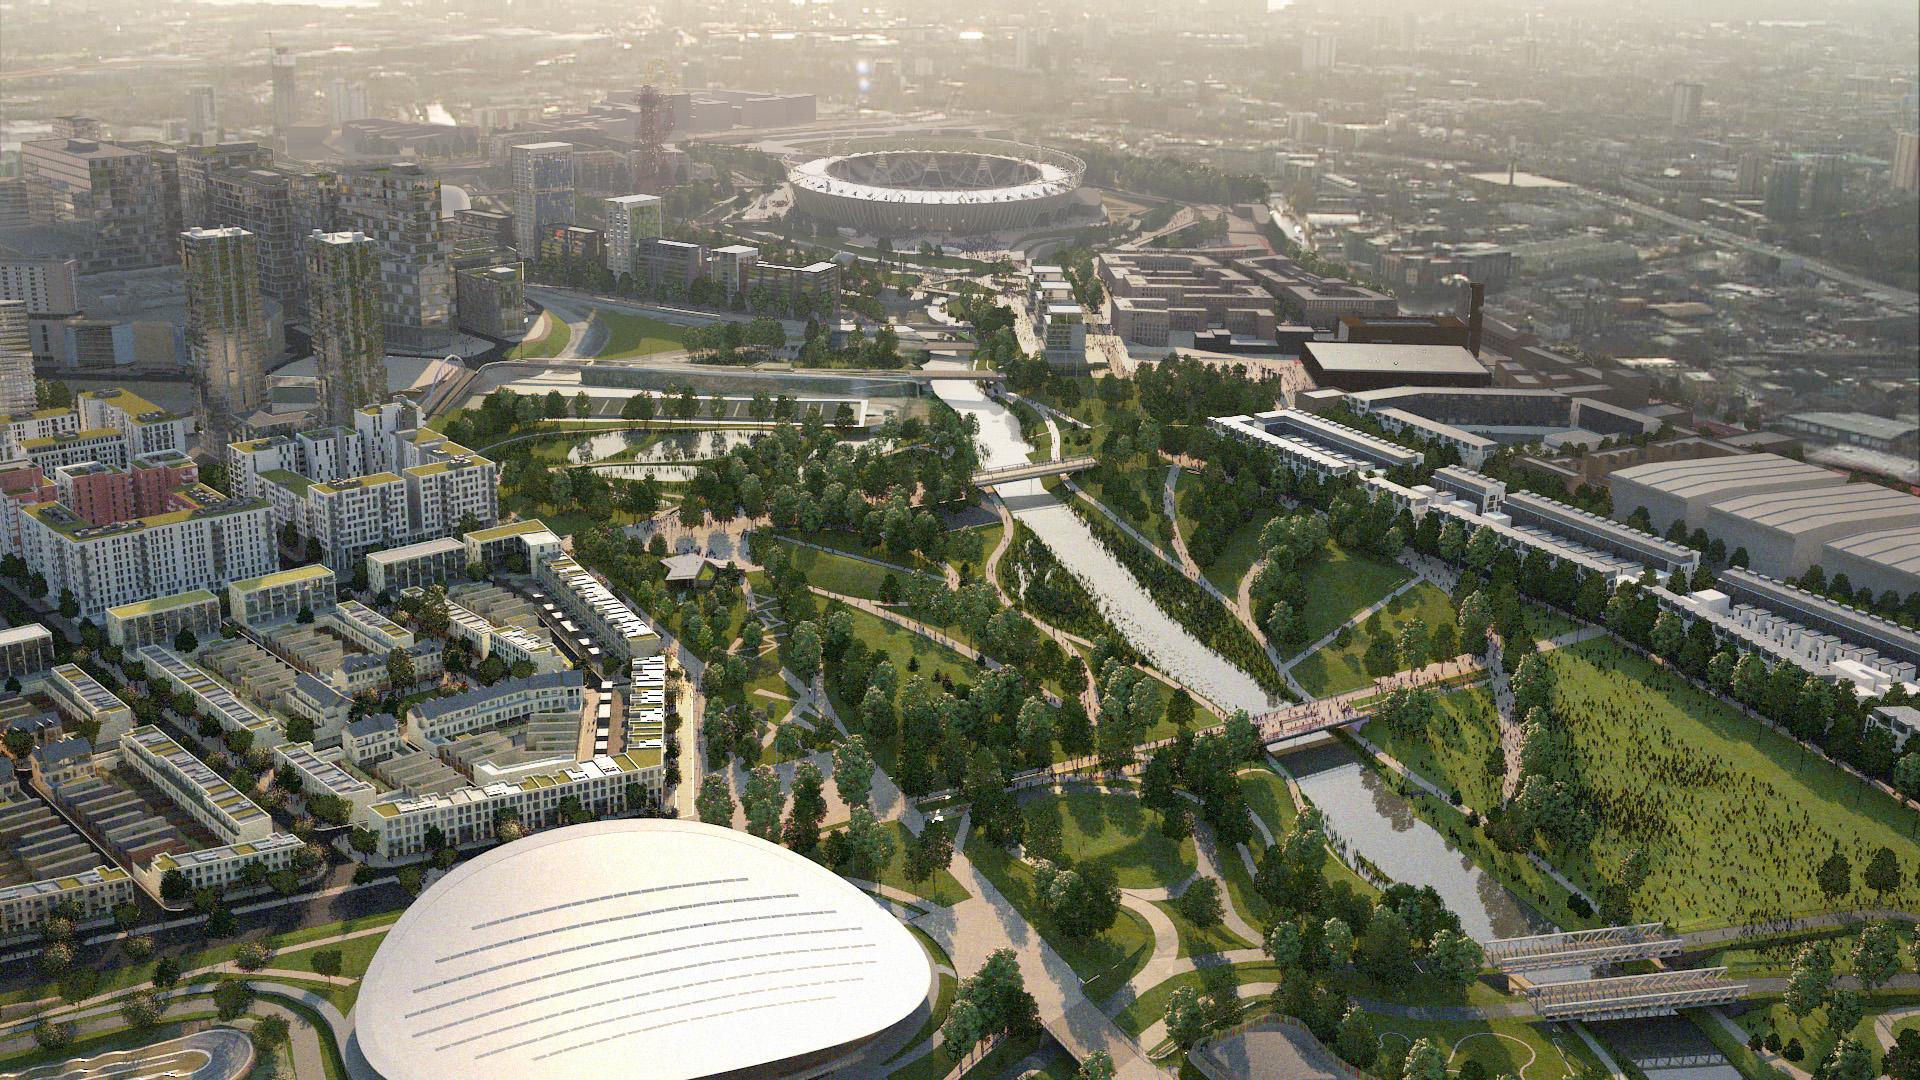 Olympic Legacy Masterplan & Neighbourhood Development, London